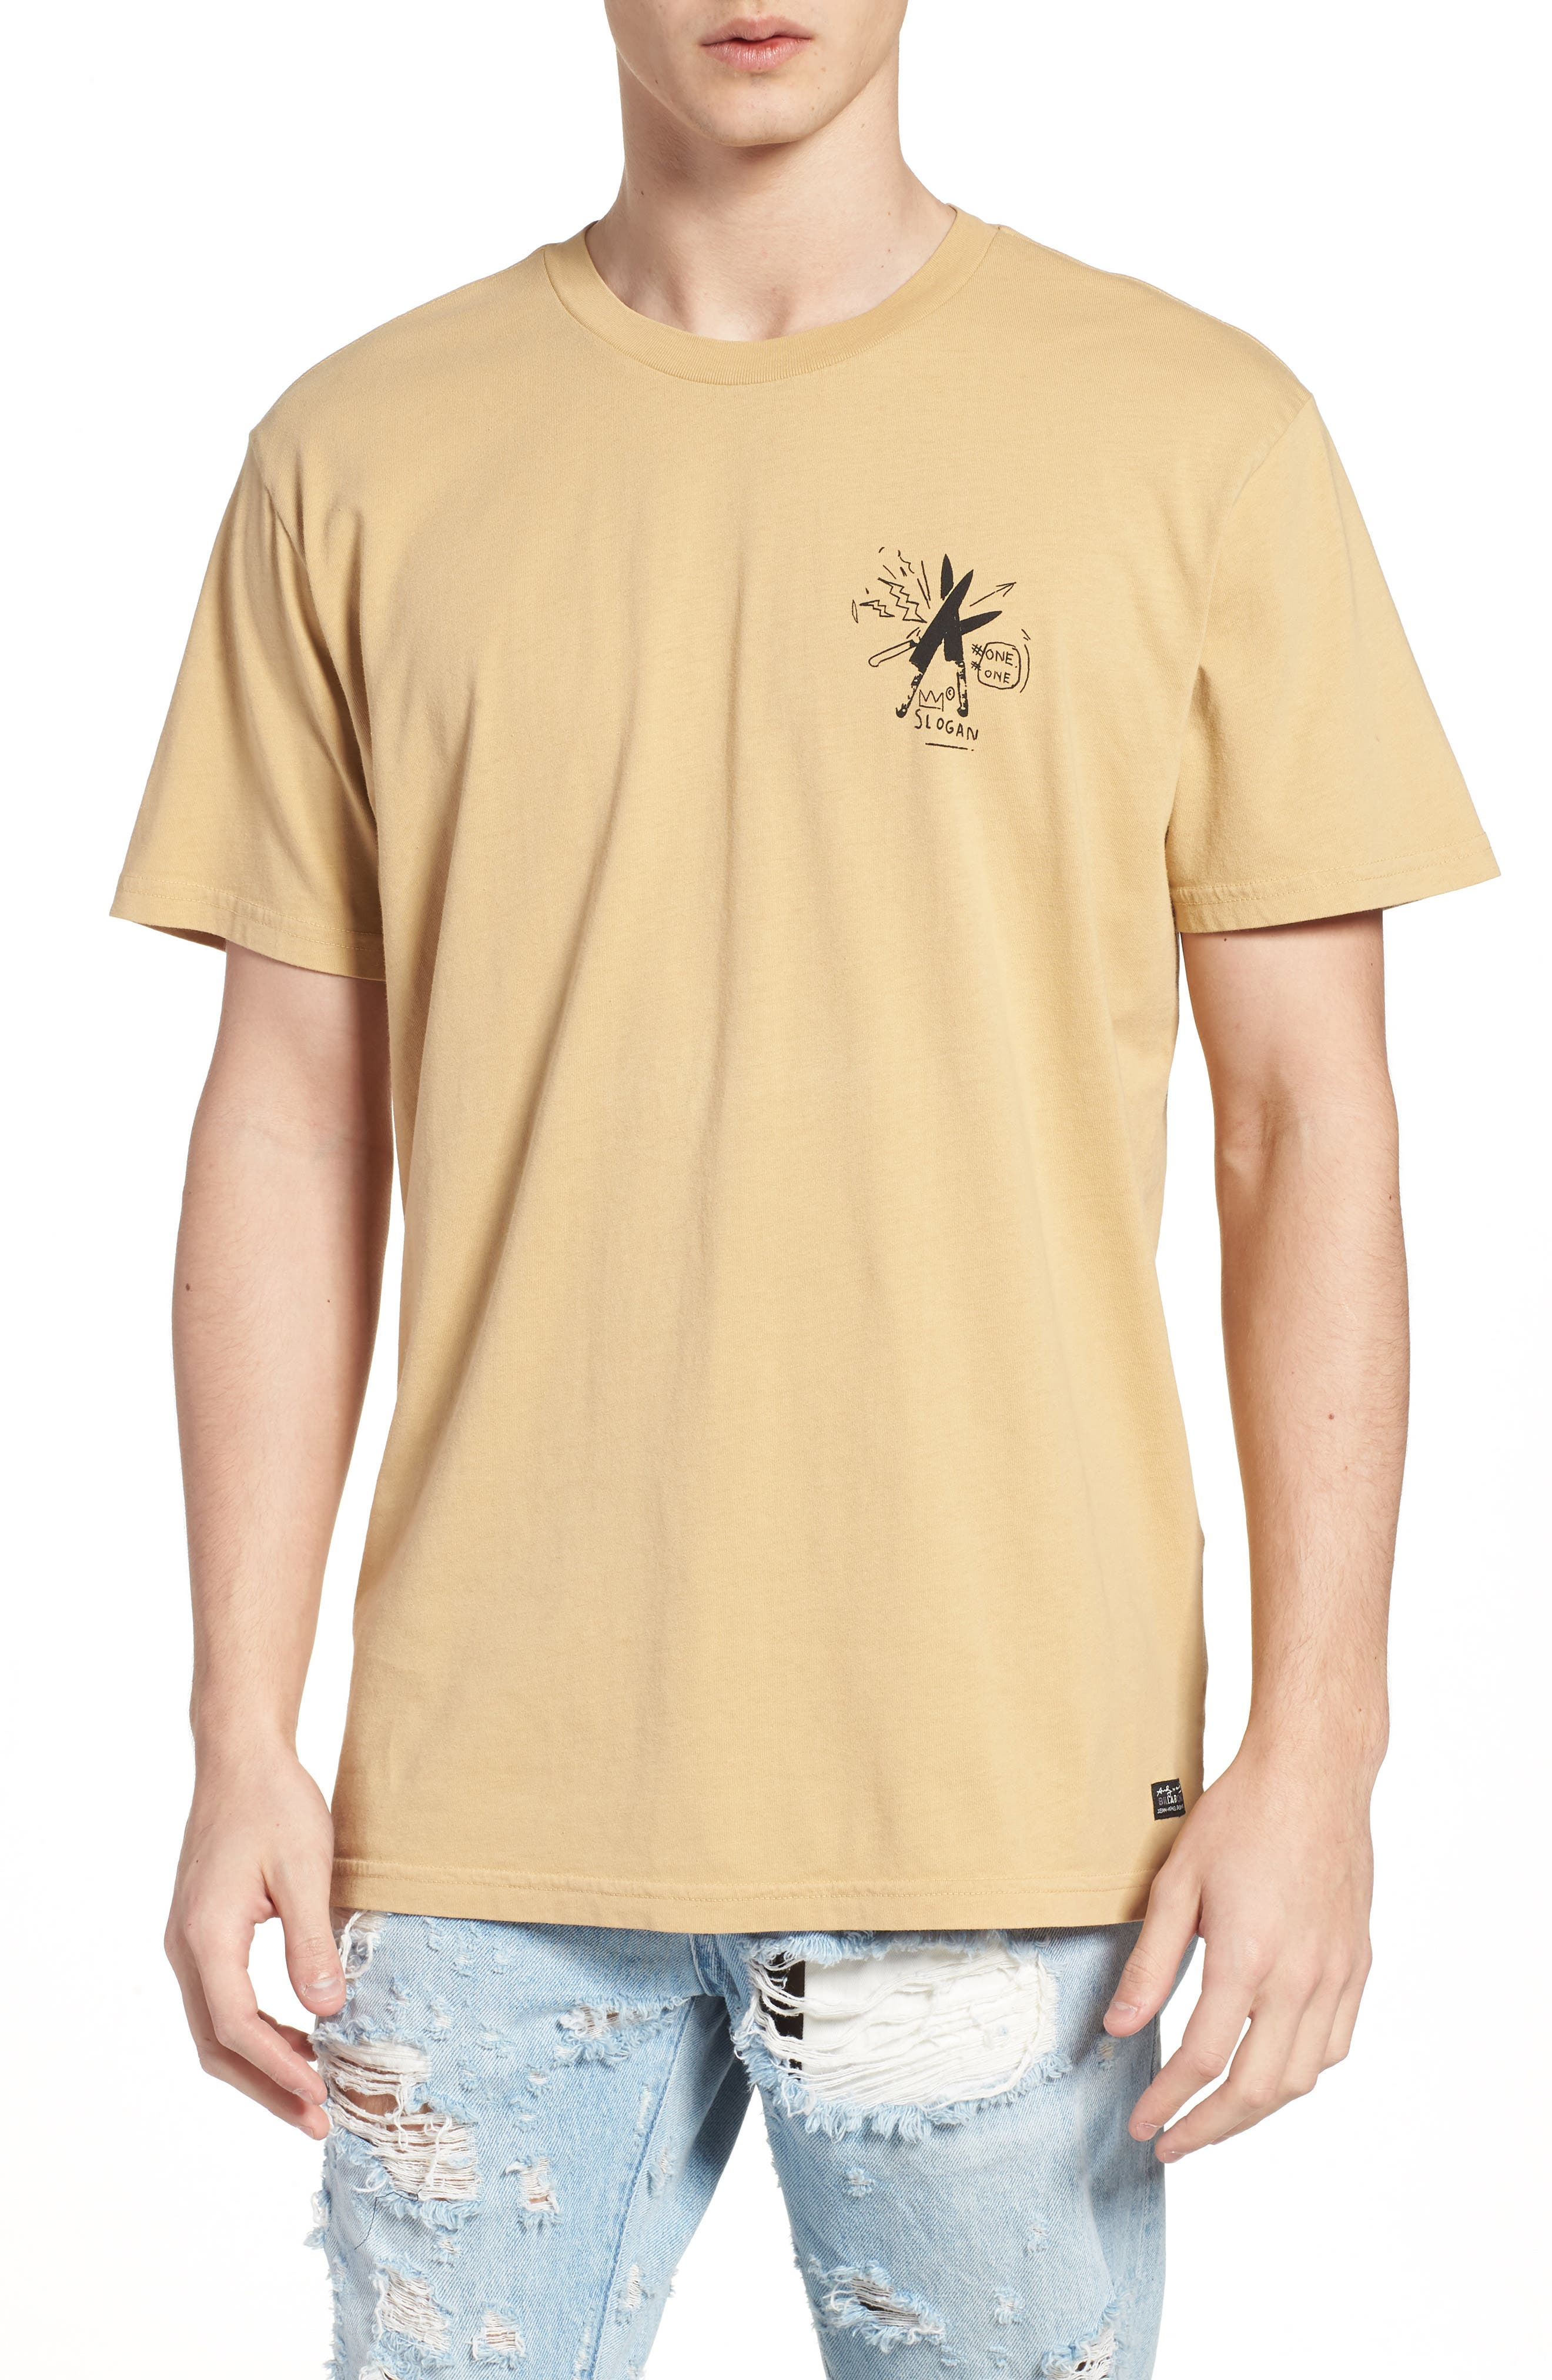 x Warhol Slogan T-Shirt,                         Main,                         color, Straw